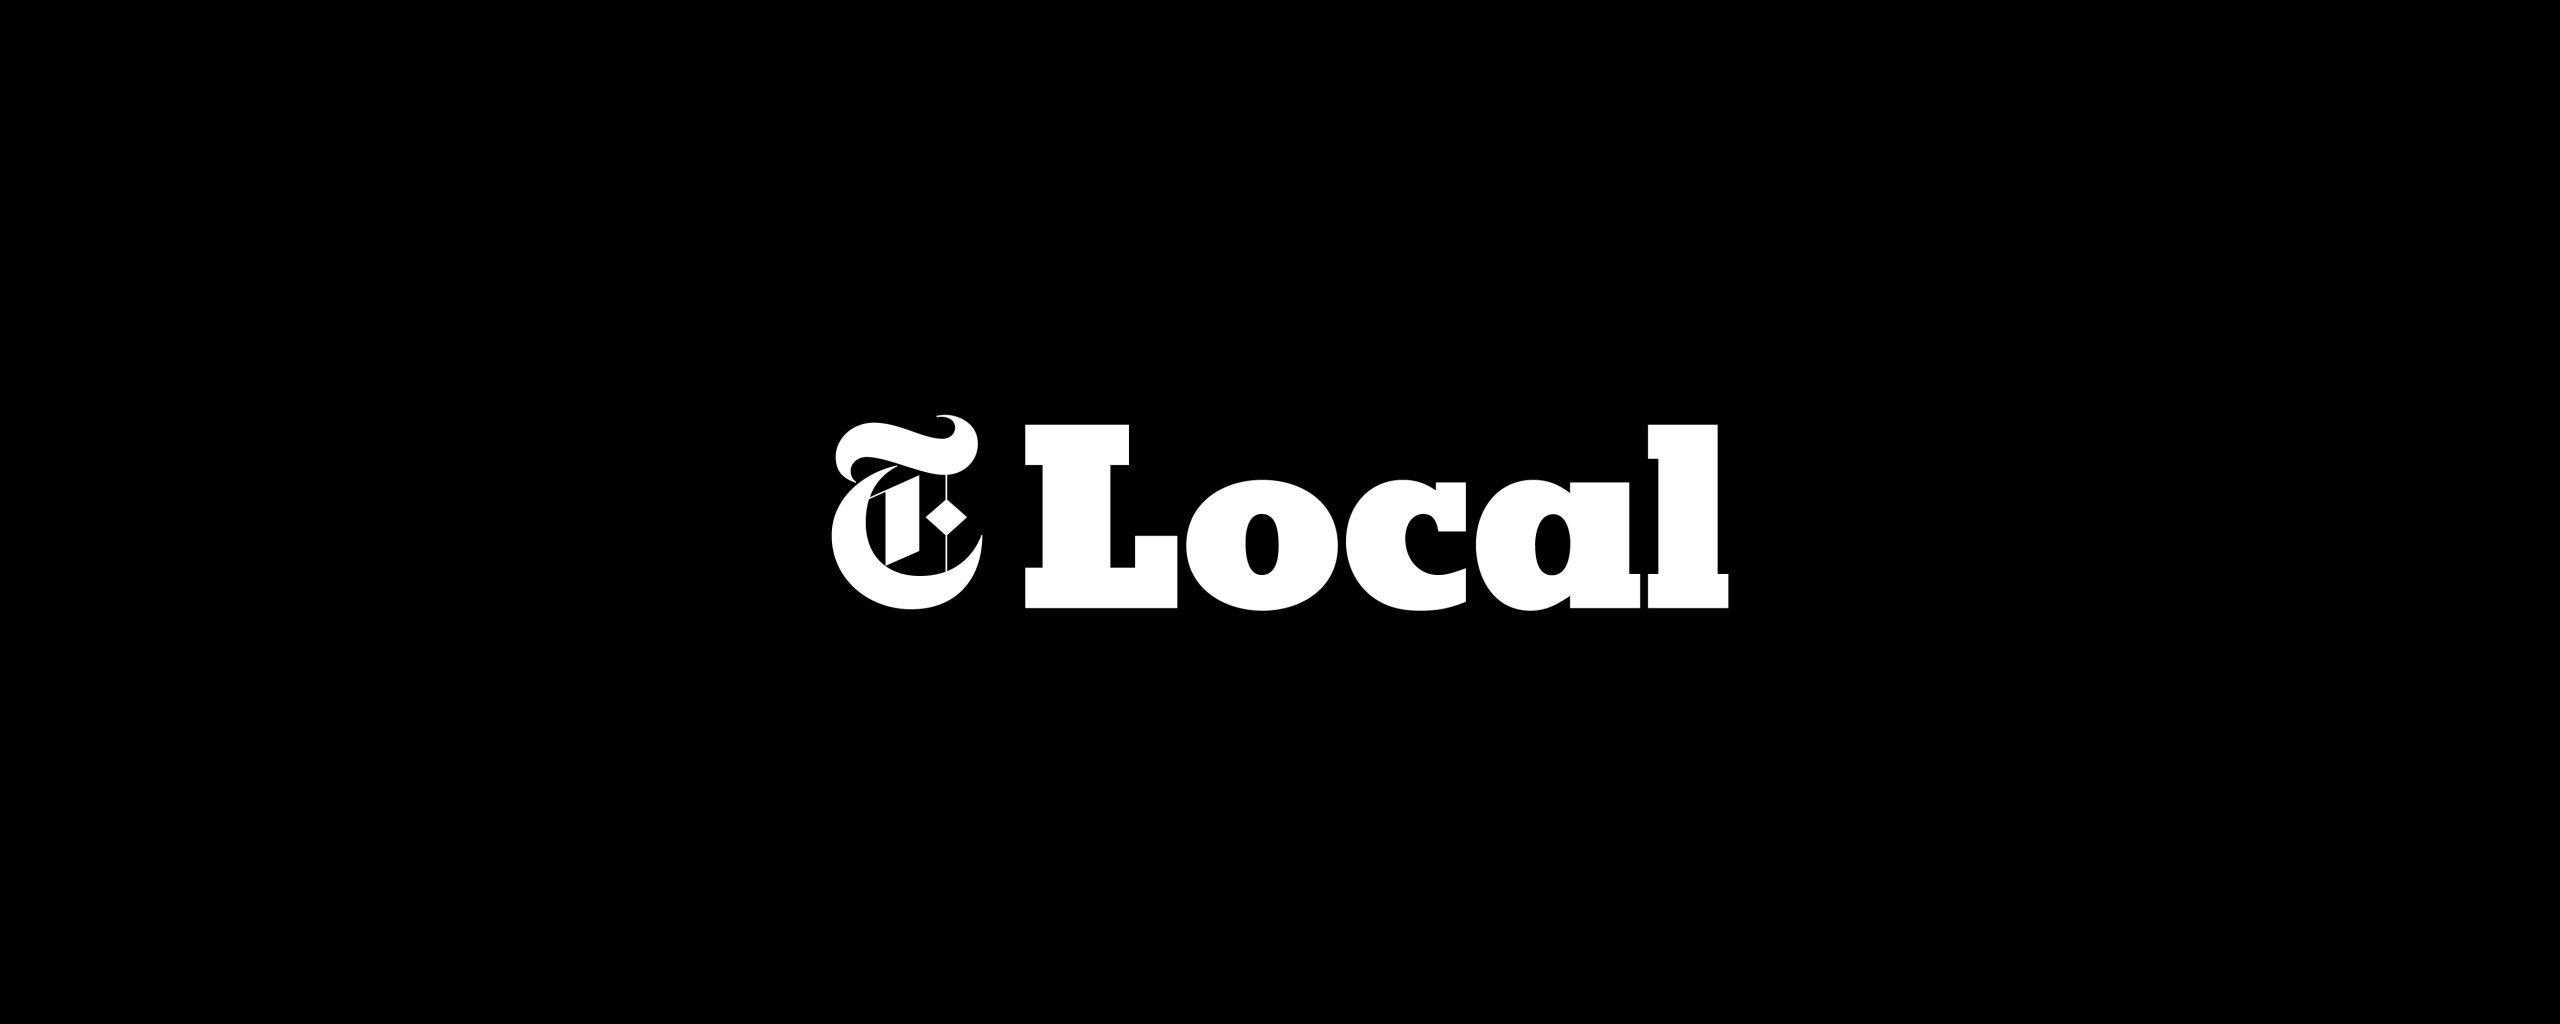 NYT-TLocal-logo-presentation